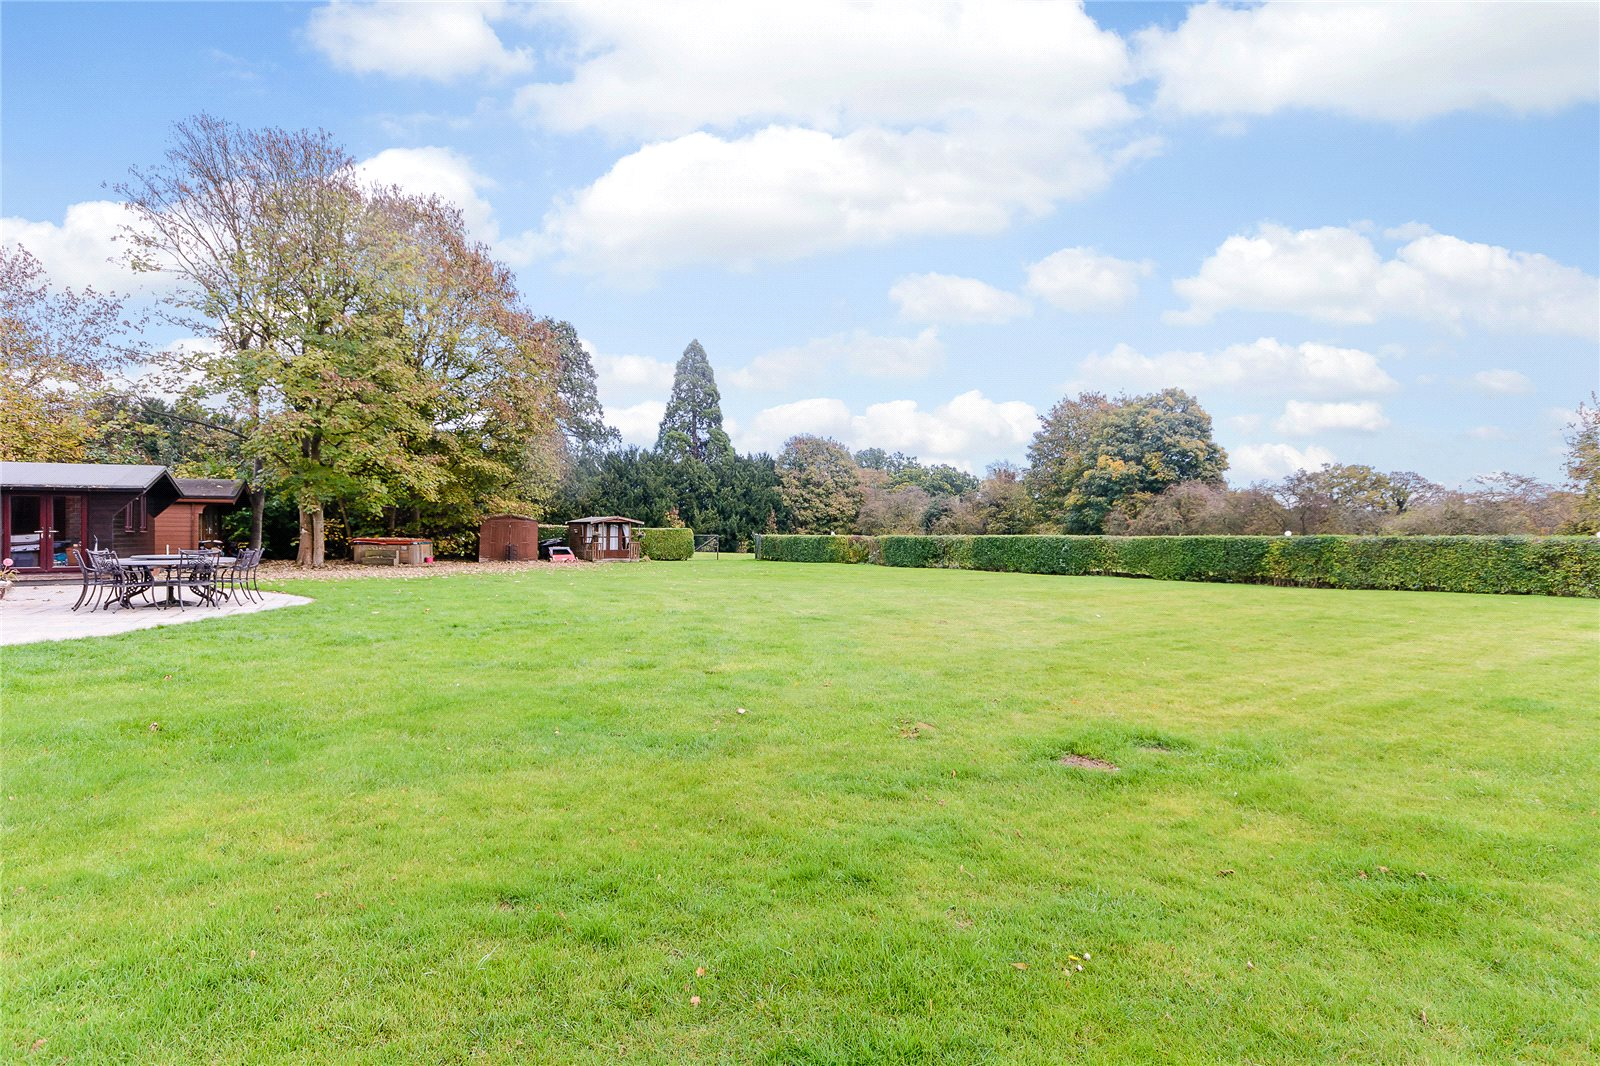 獨棟家庭住宅 為 出售 在 Danesbury Park Road, Welwyn, Hertfordshire, AL6 Welwyn, 英格蘭